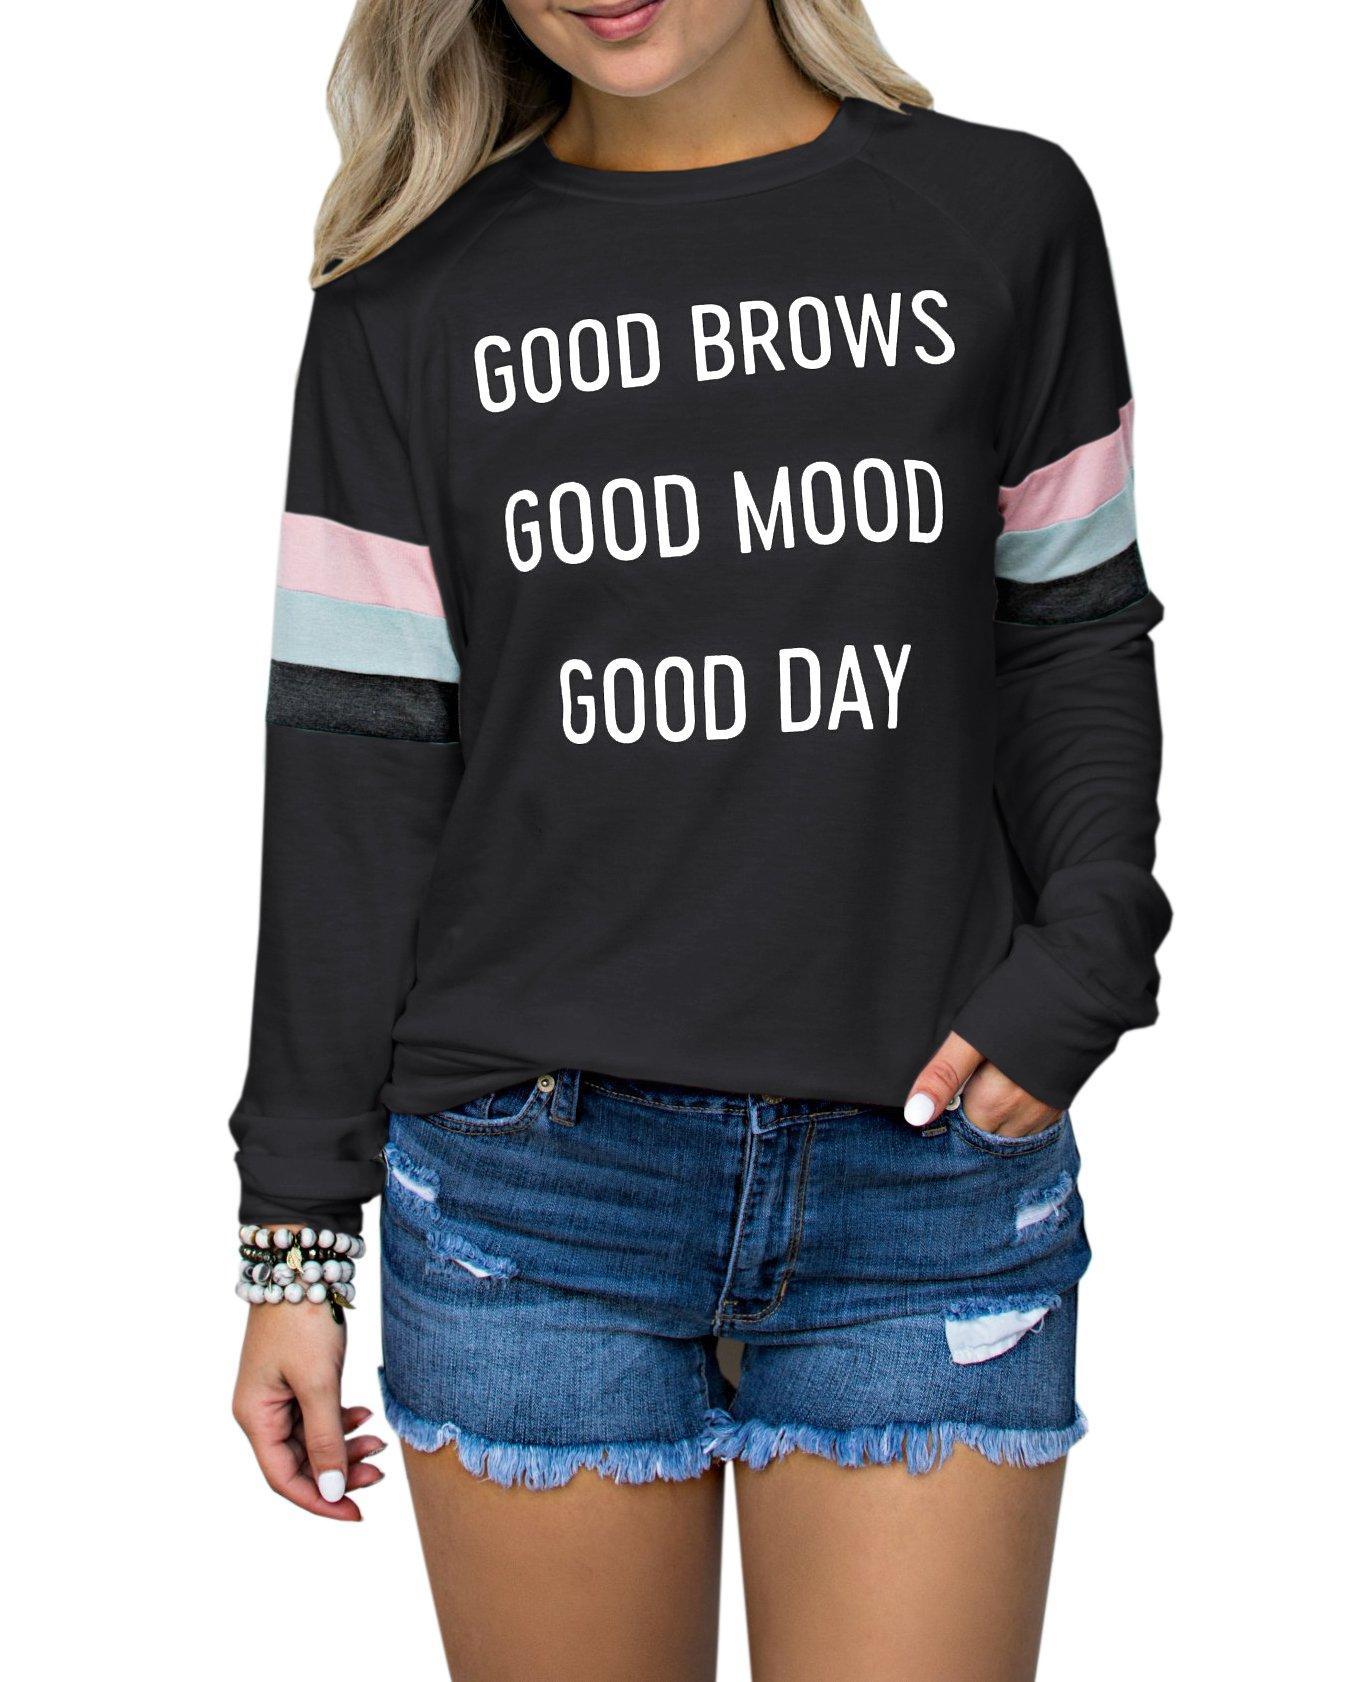 Womens Crewneck Varsity Stripe Sweatshirts Good Brows Good Mood Good Day Graphic Shirts Tops